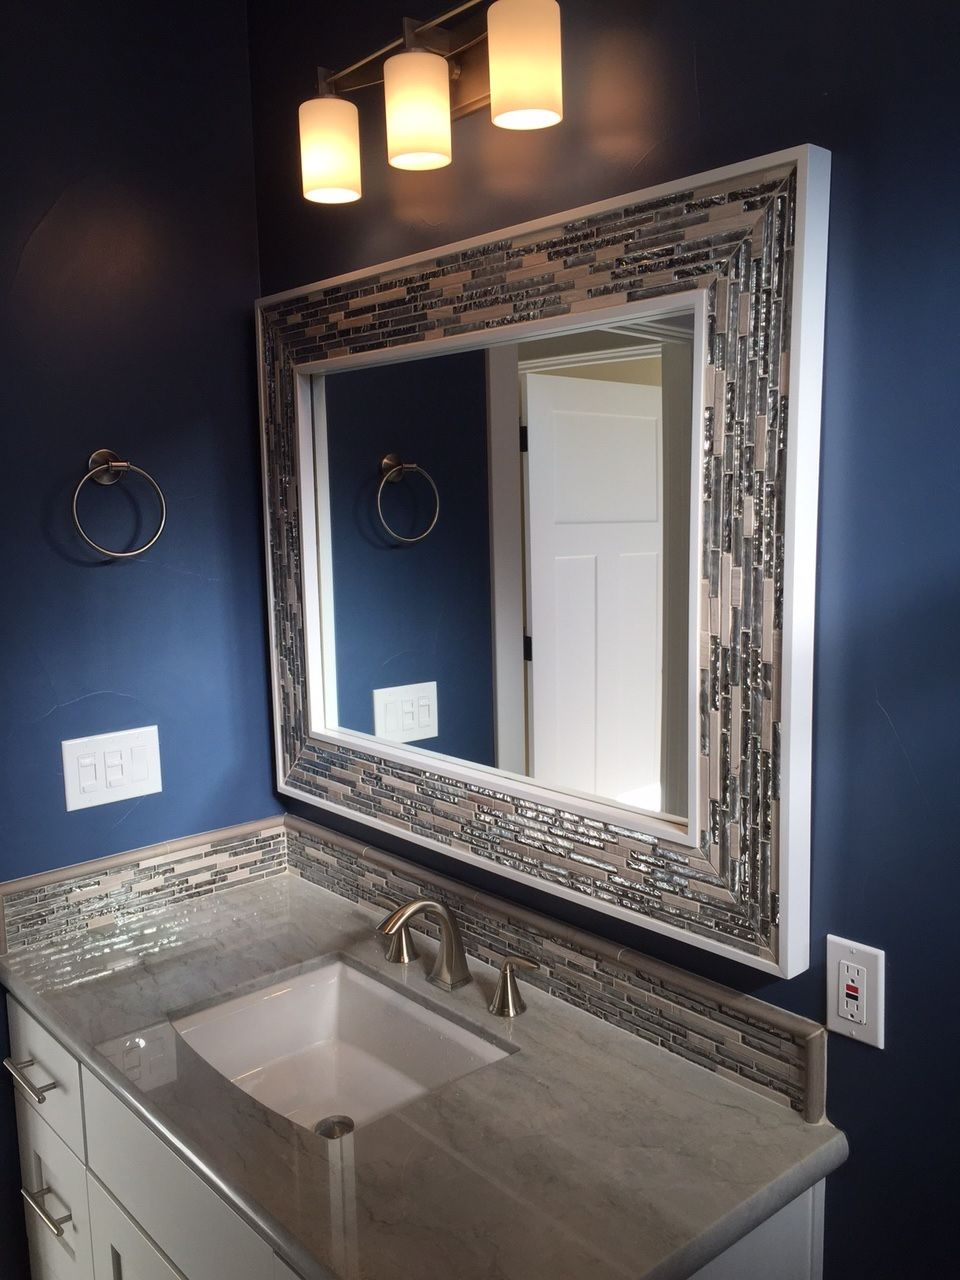 Vanities. Tile Bathrooms ... - Pin By Rustic Floor Covering On Tiles From The Designer Pinterest